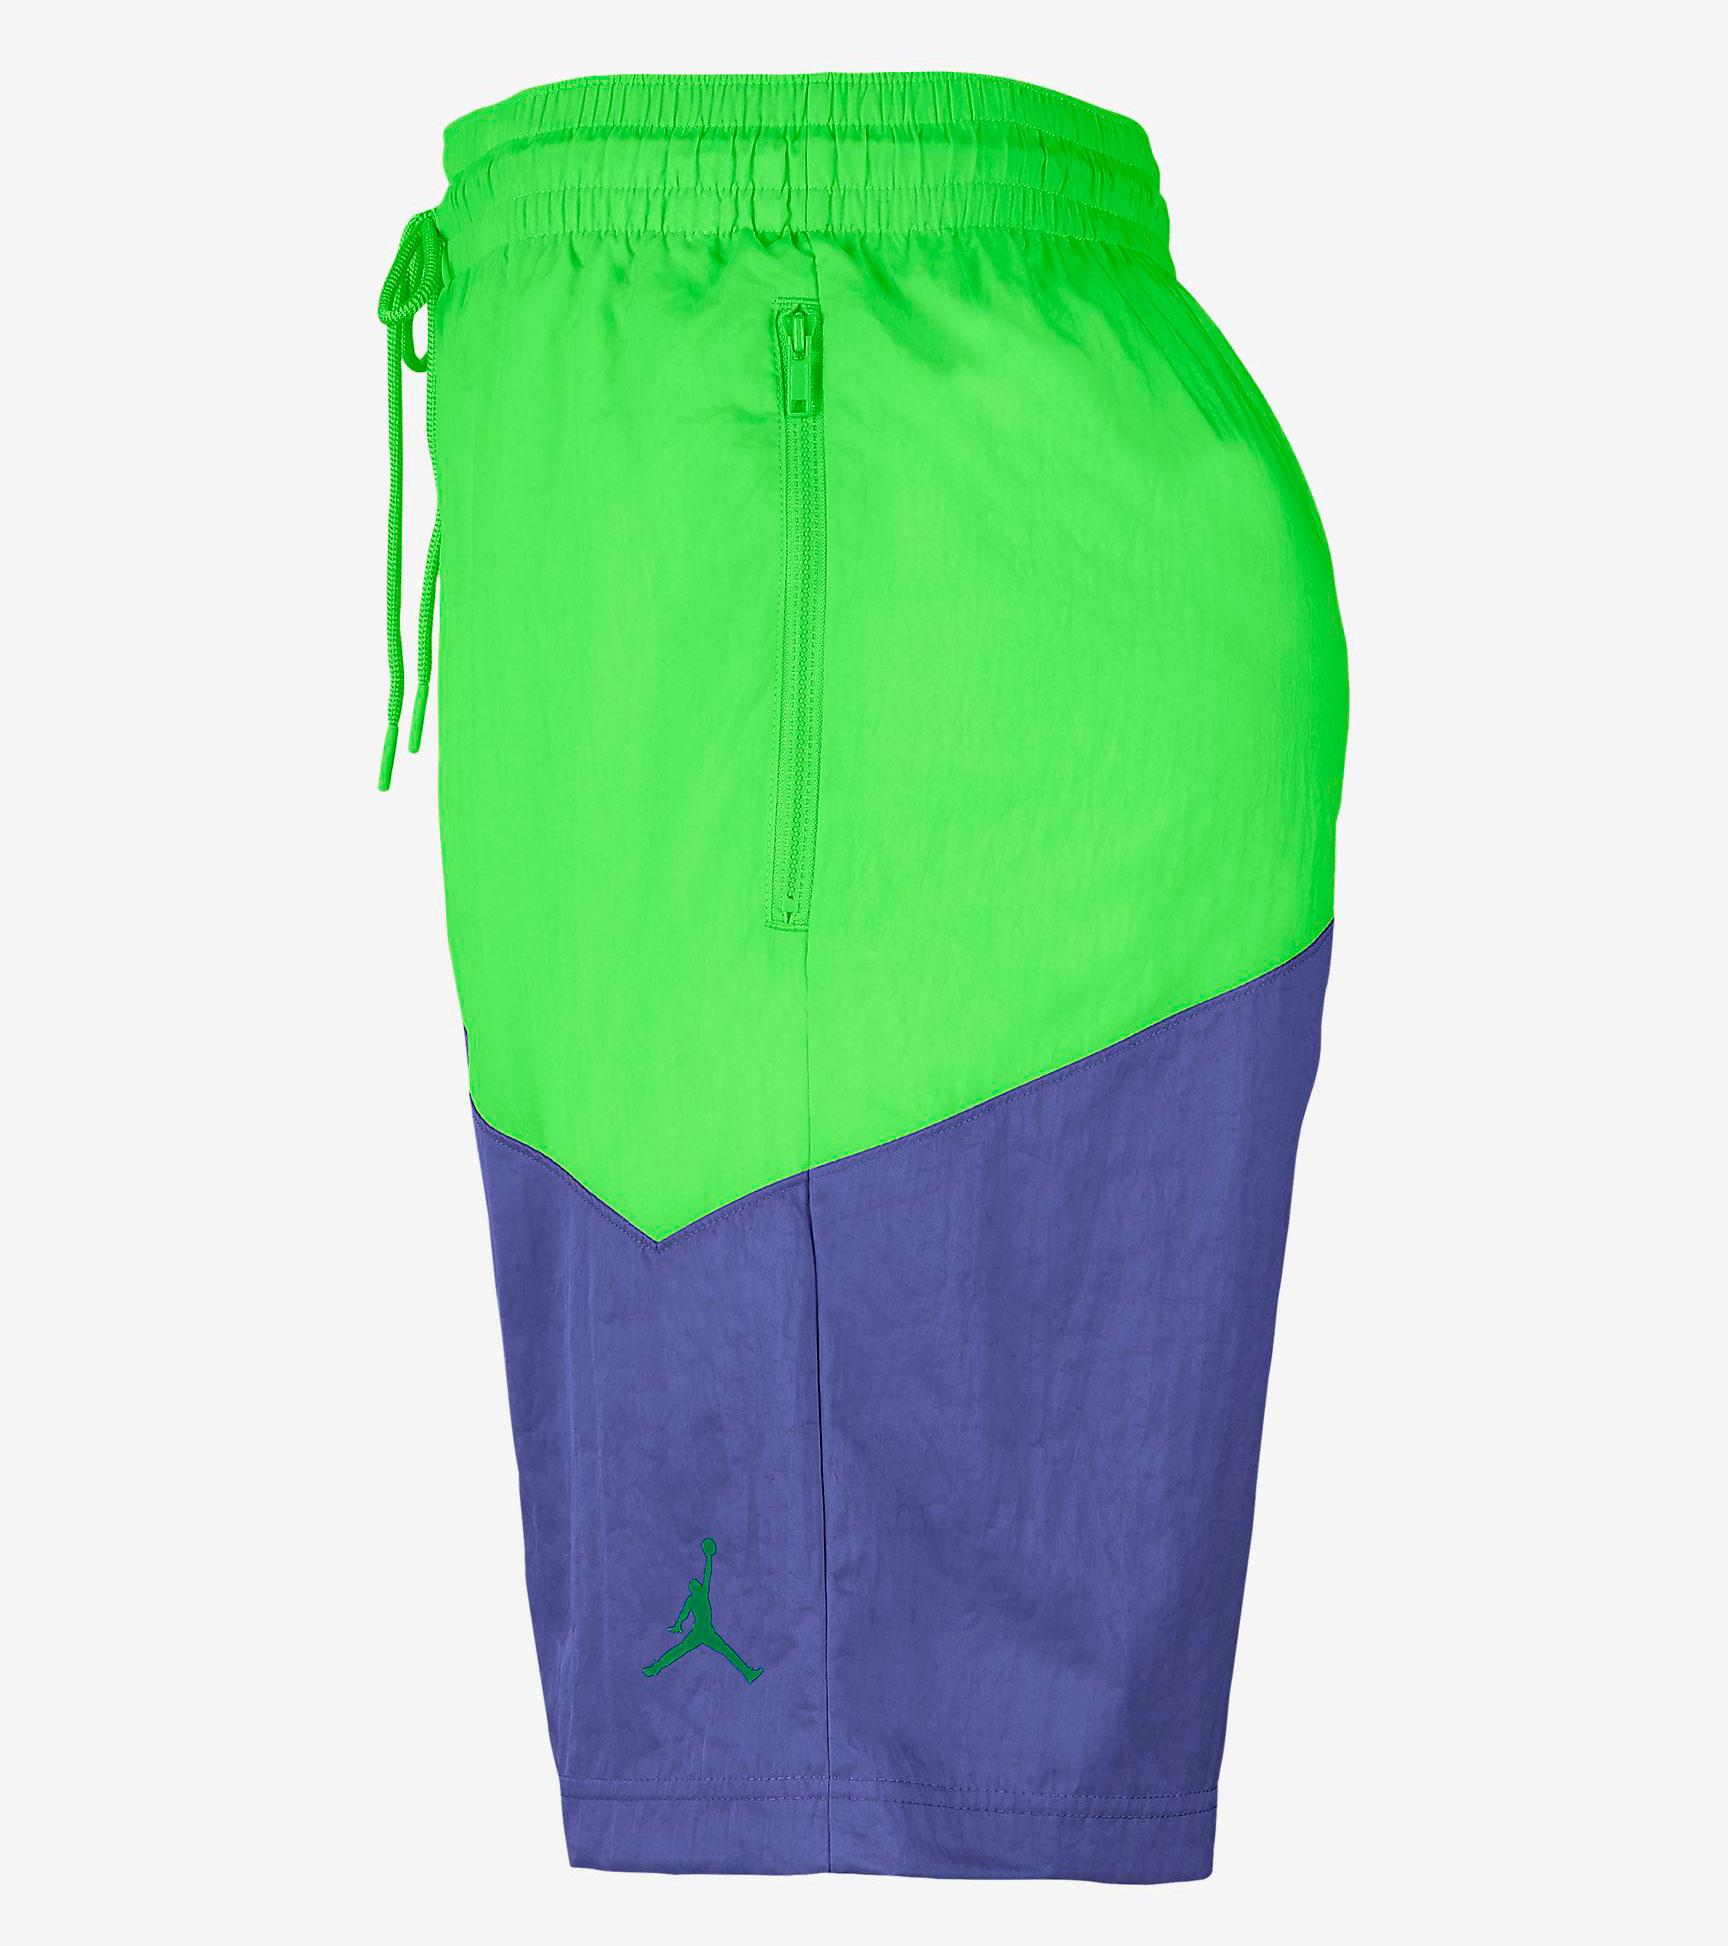 air-jordan-1-mid-hulk-shorts-2